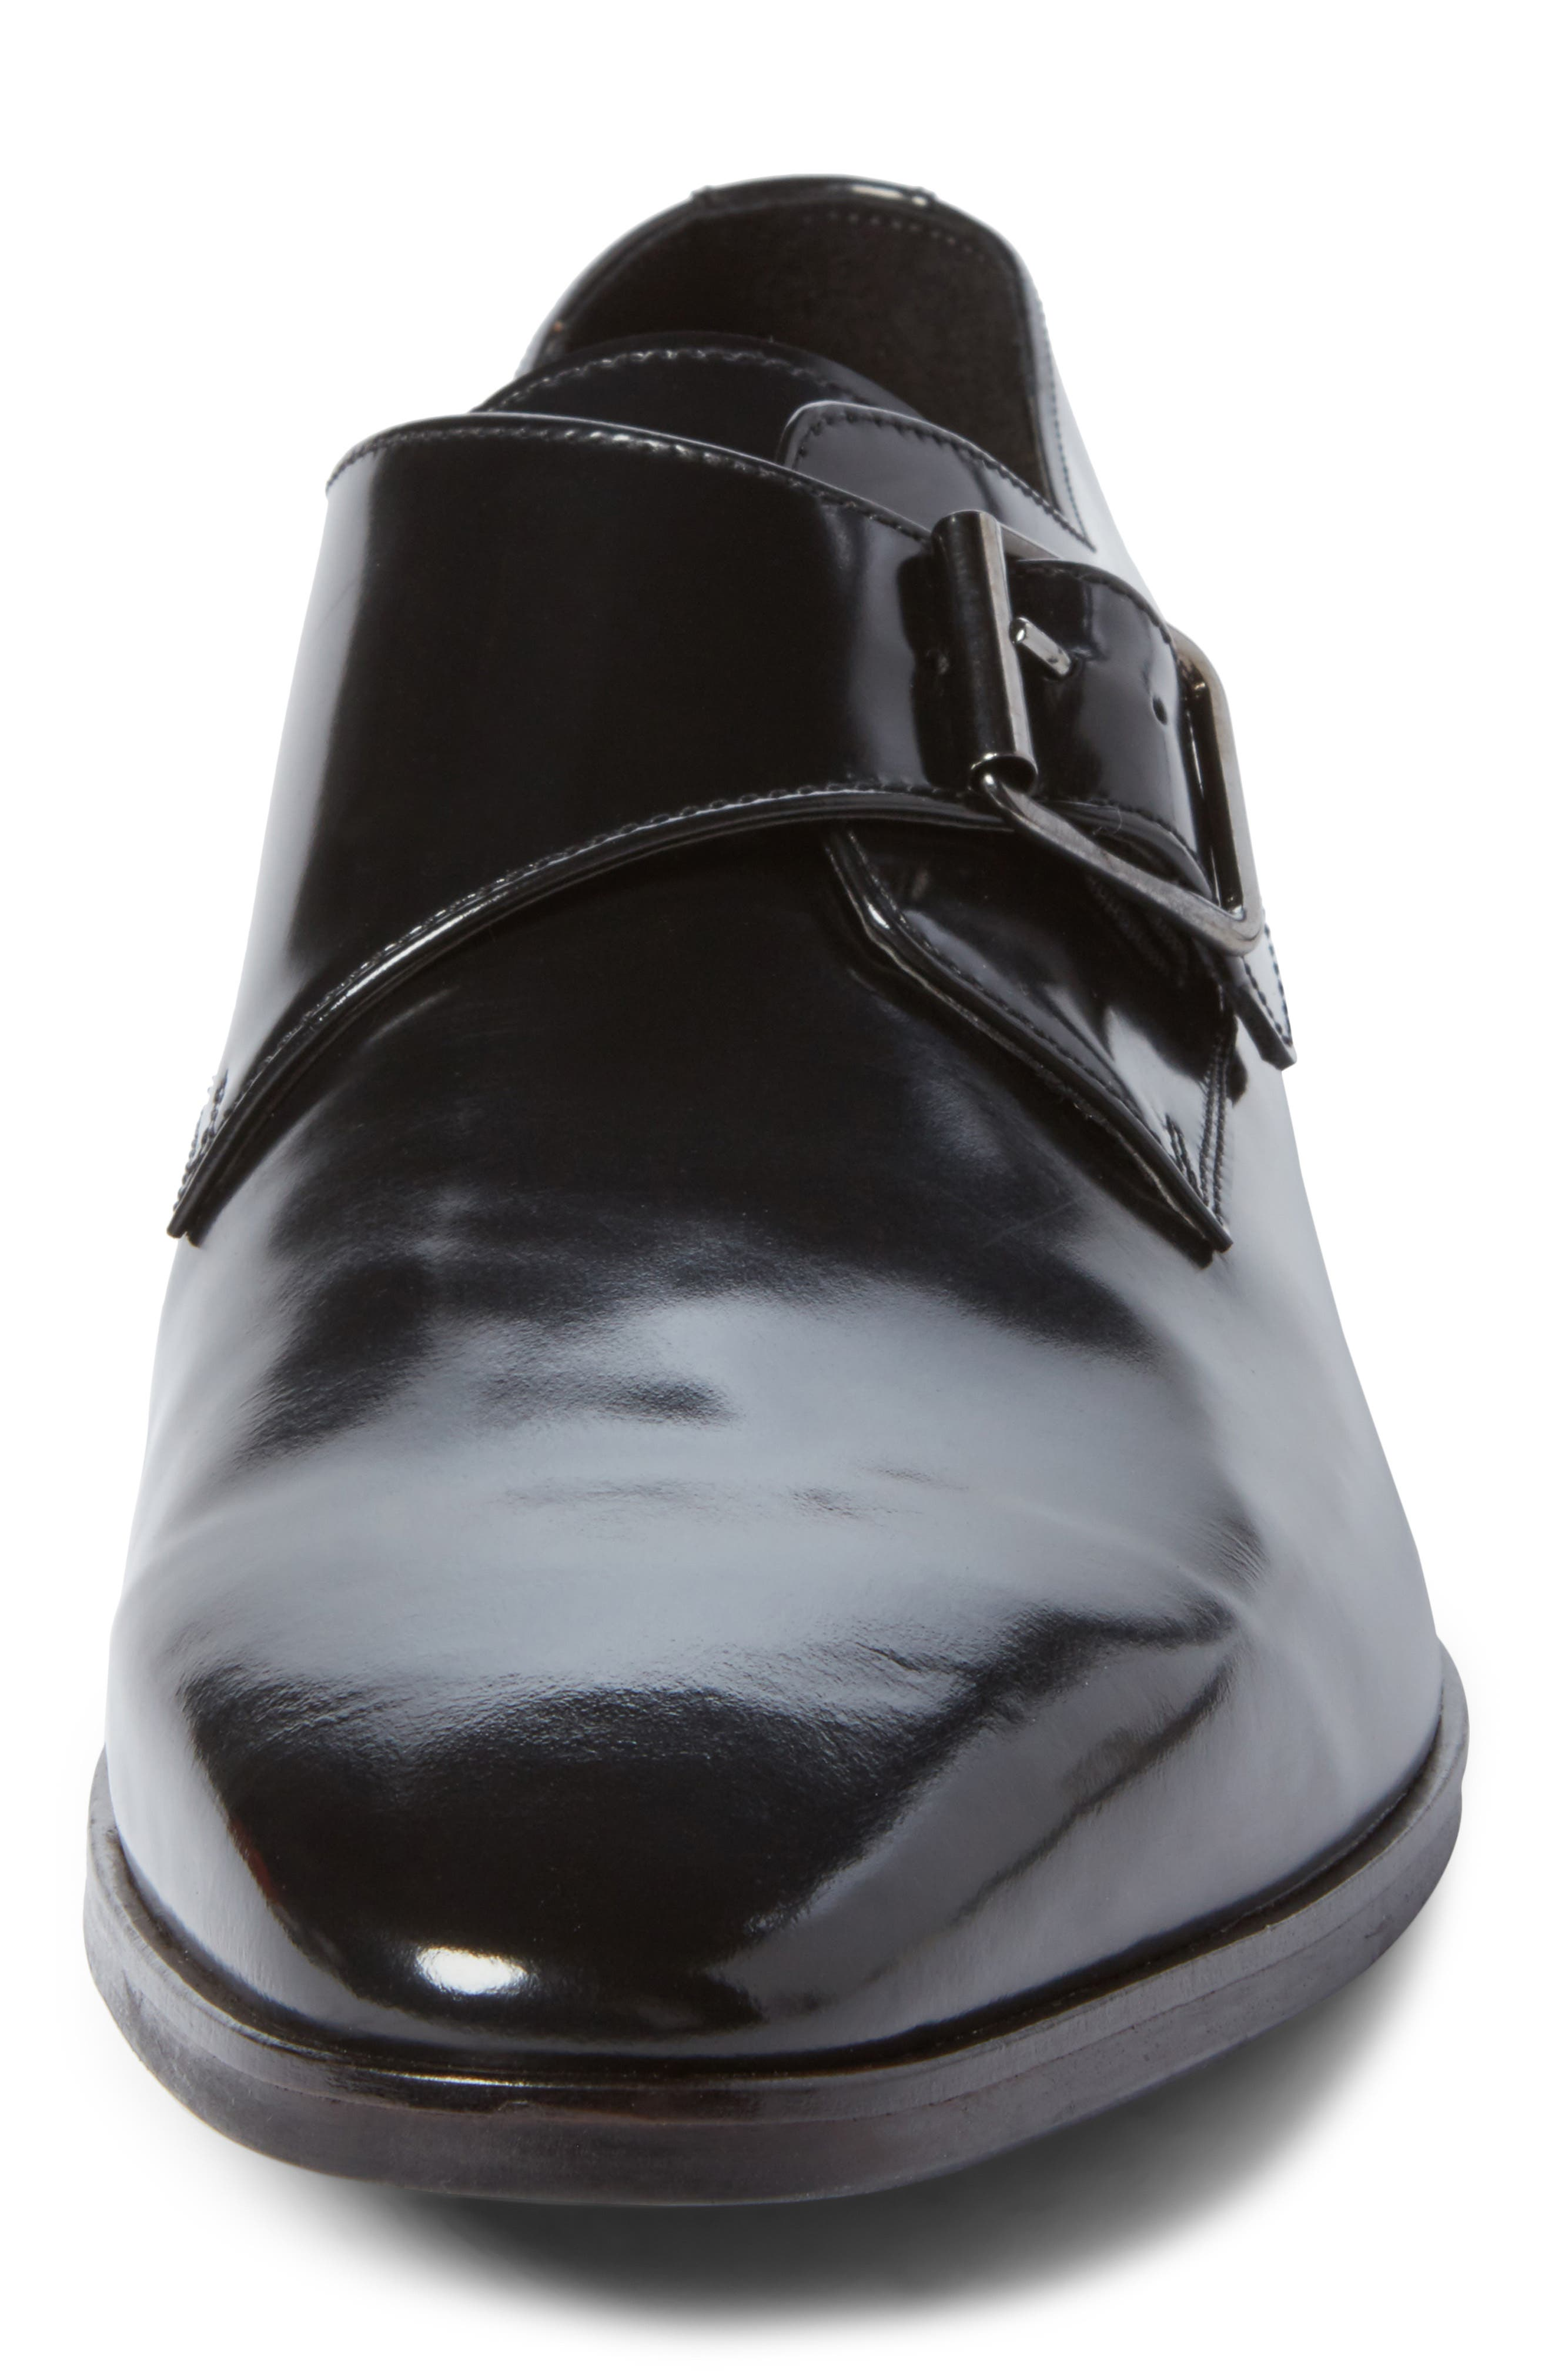 Webster Single Strap Monk Shoe,                             Alternate thumbnail 4, color,                             001